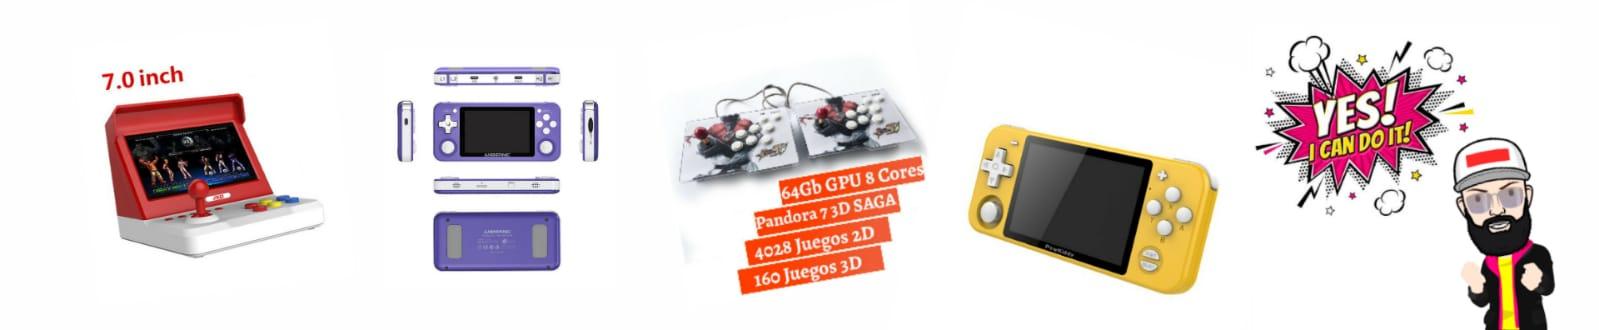 Retro Arcade Neo Geo Anbernic Pandora Box Consoles